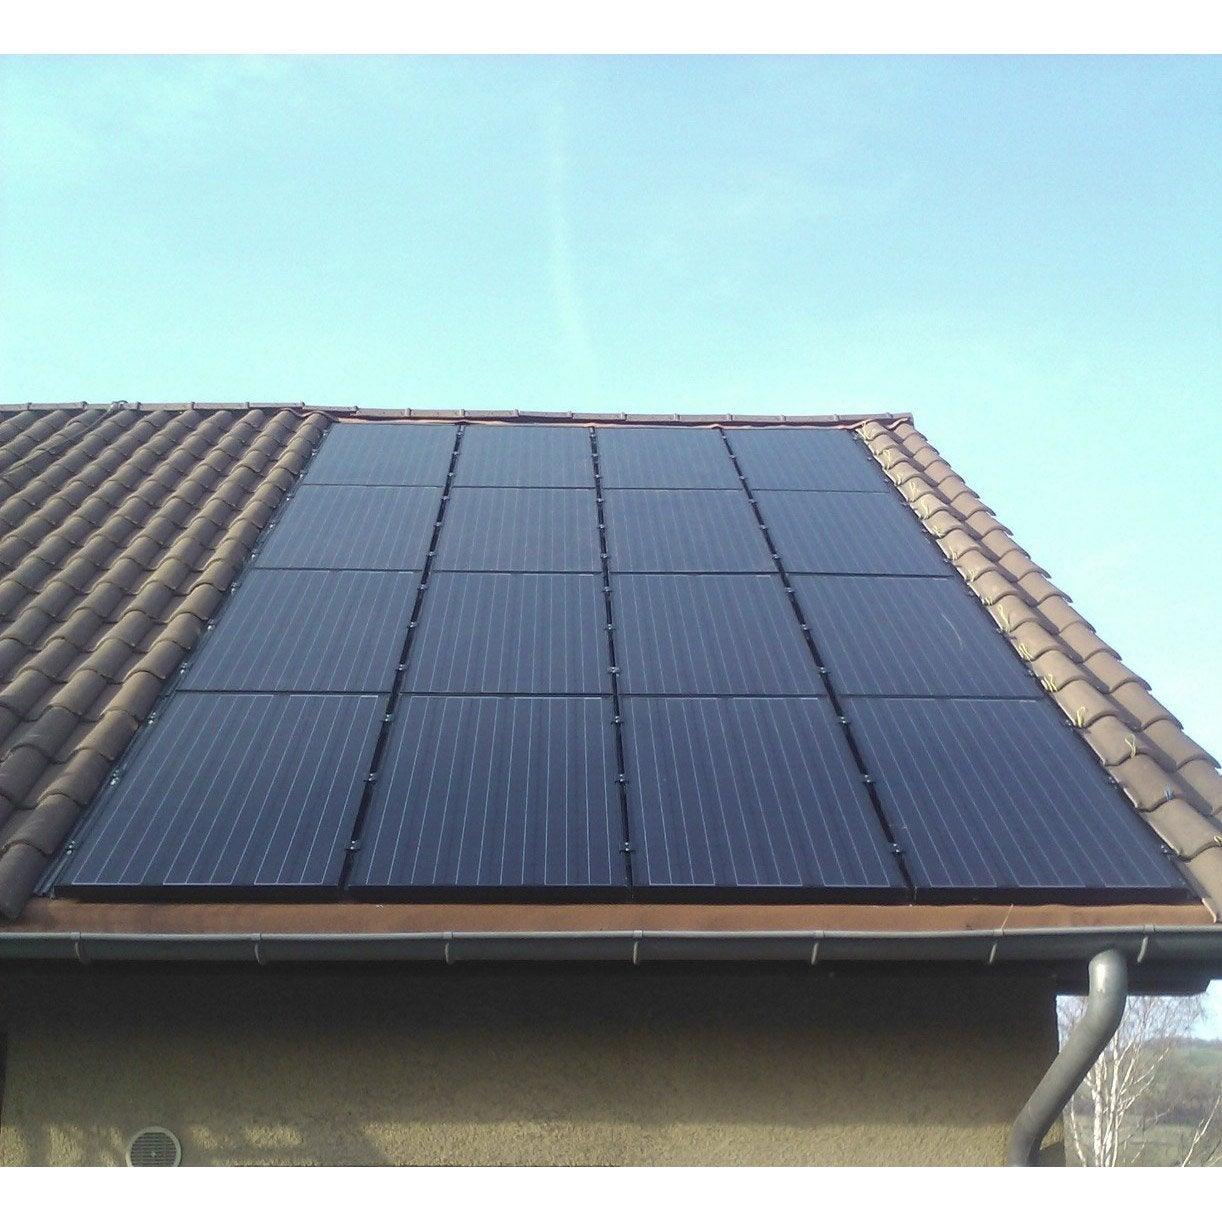 kit solaire photovolta que premium int gr watt home 5880w leroy merlin. Black Bedroom Furniture Sets. Home Design Ideas